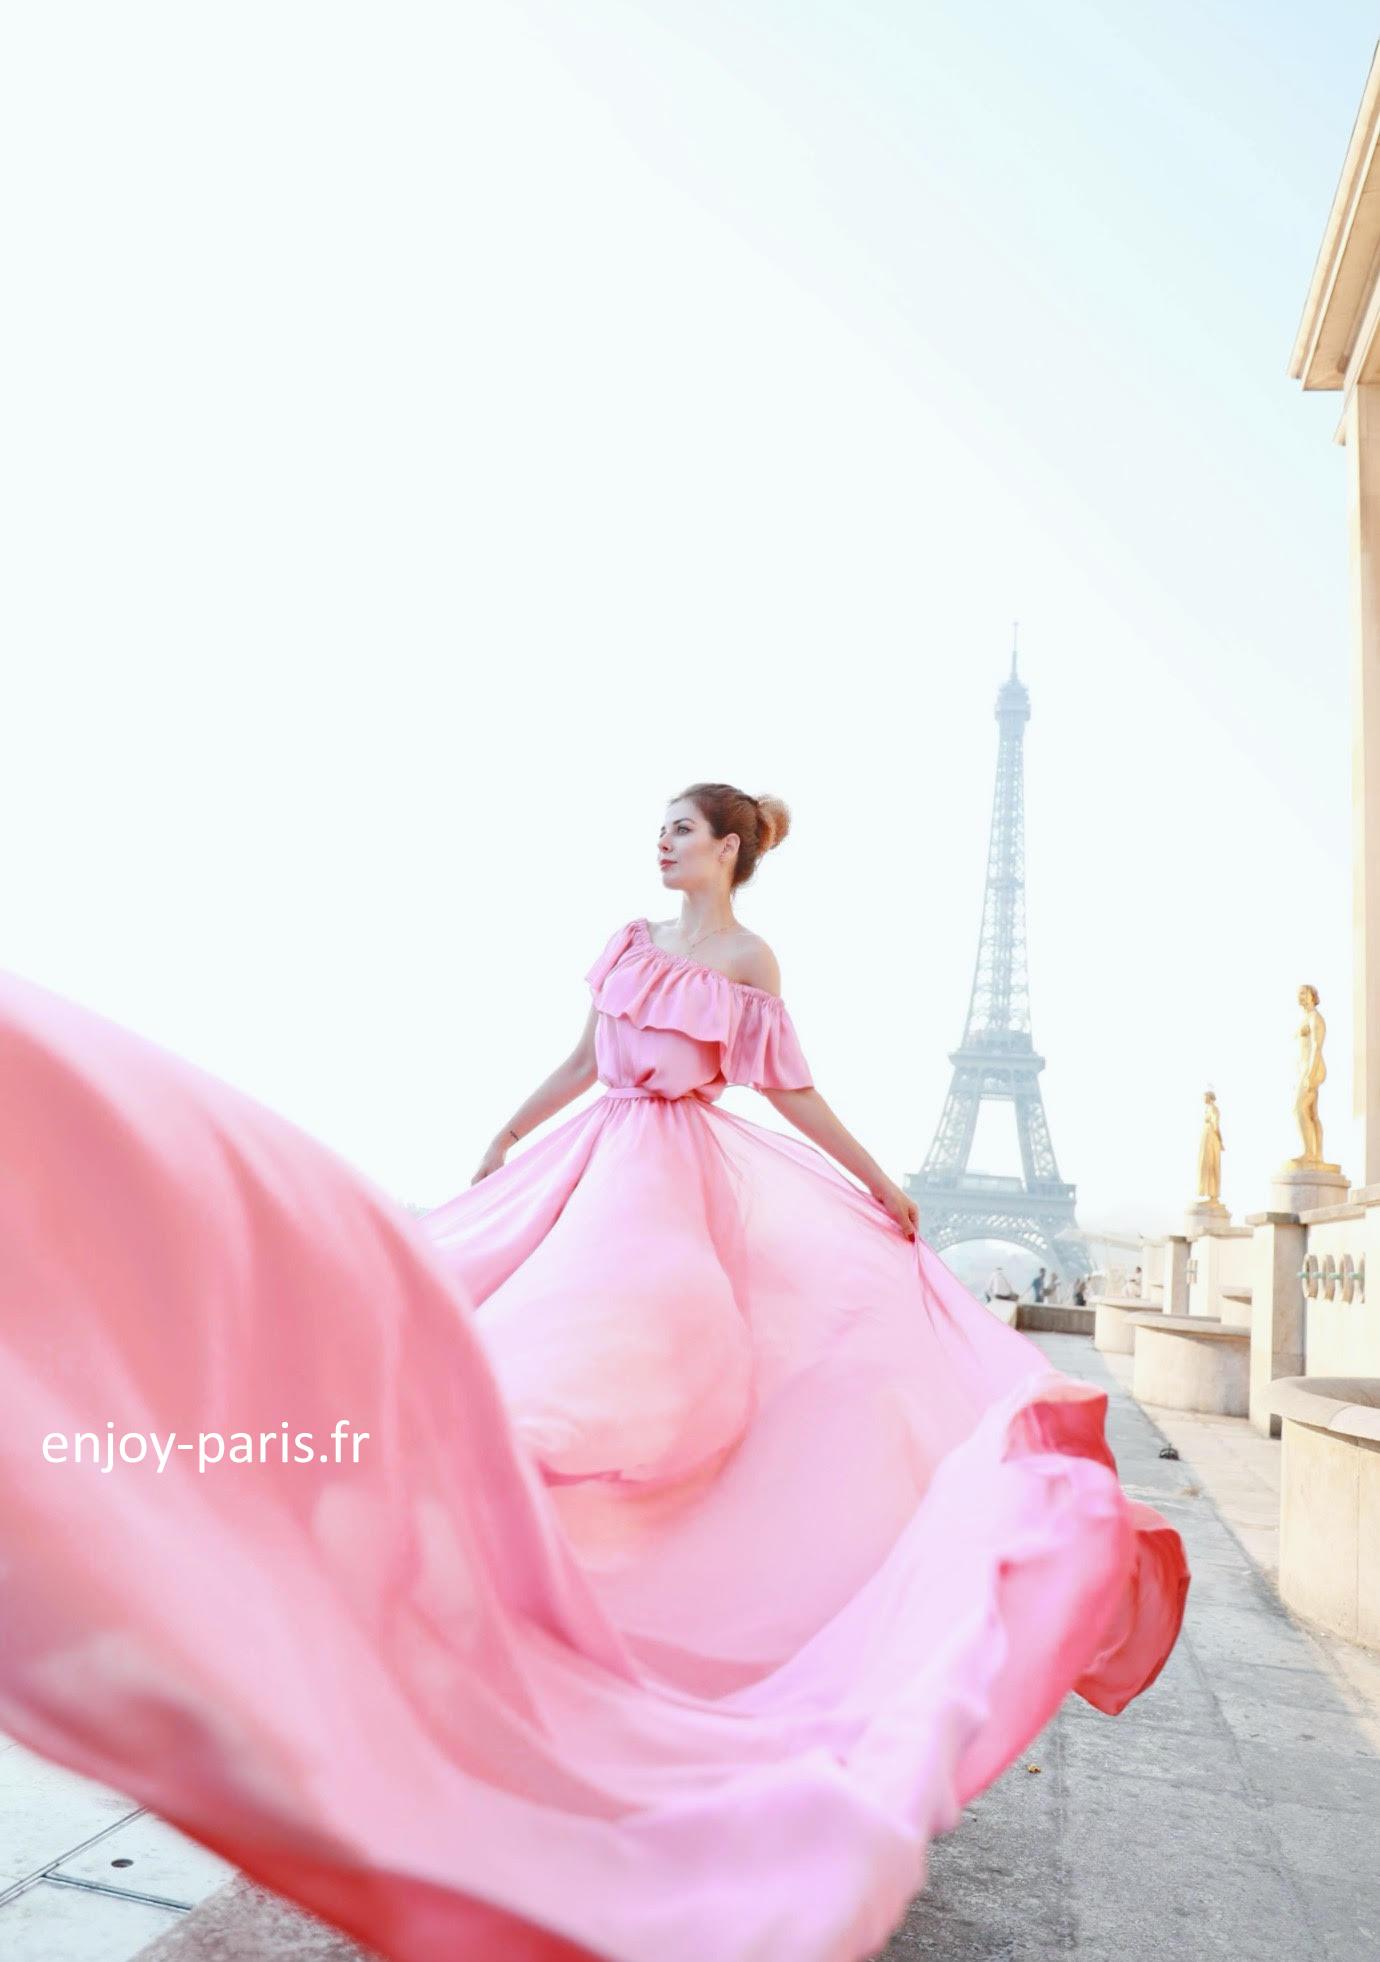 2_pink_dress.jpg